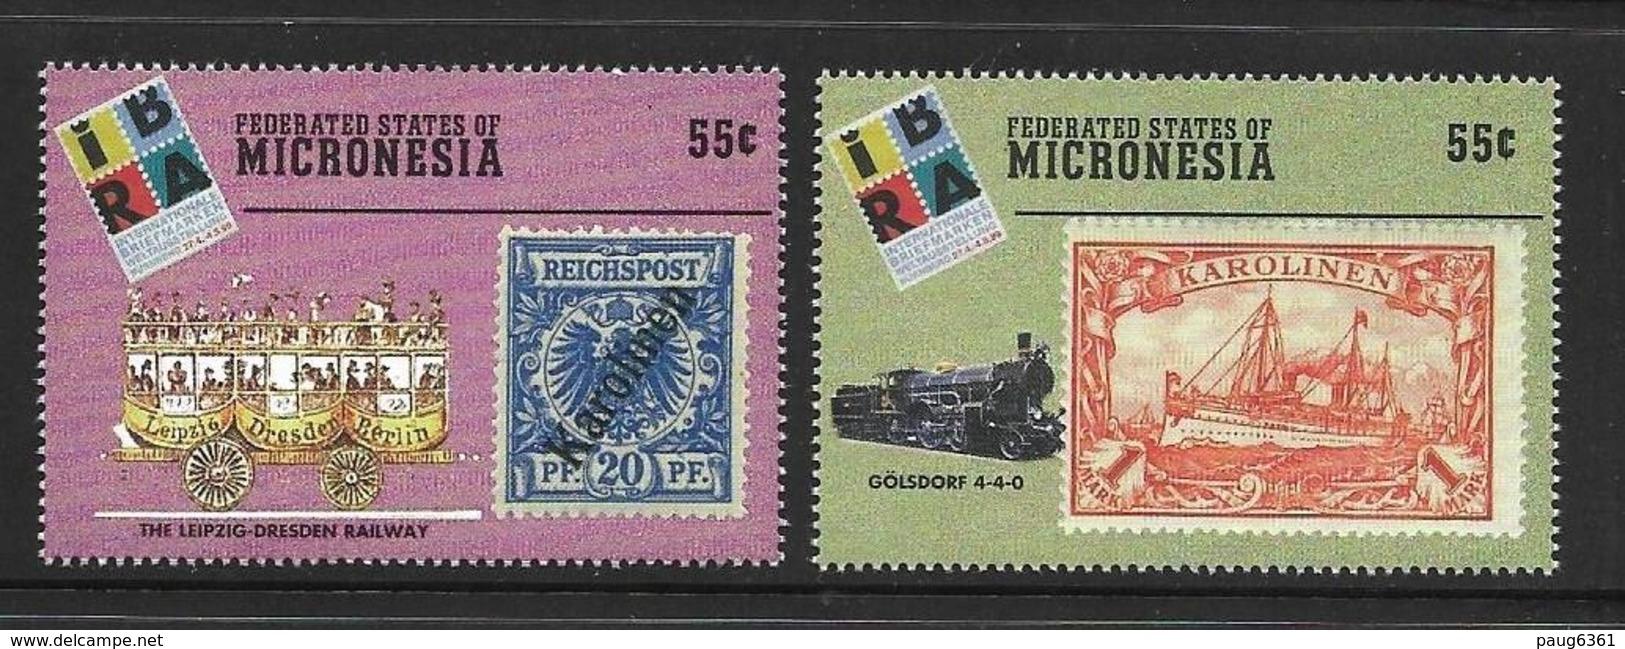 MICRONESIE 1999 IBRA'99  YVERT N°622/23  NEUF MNH** - Micronésie